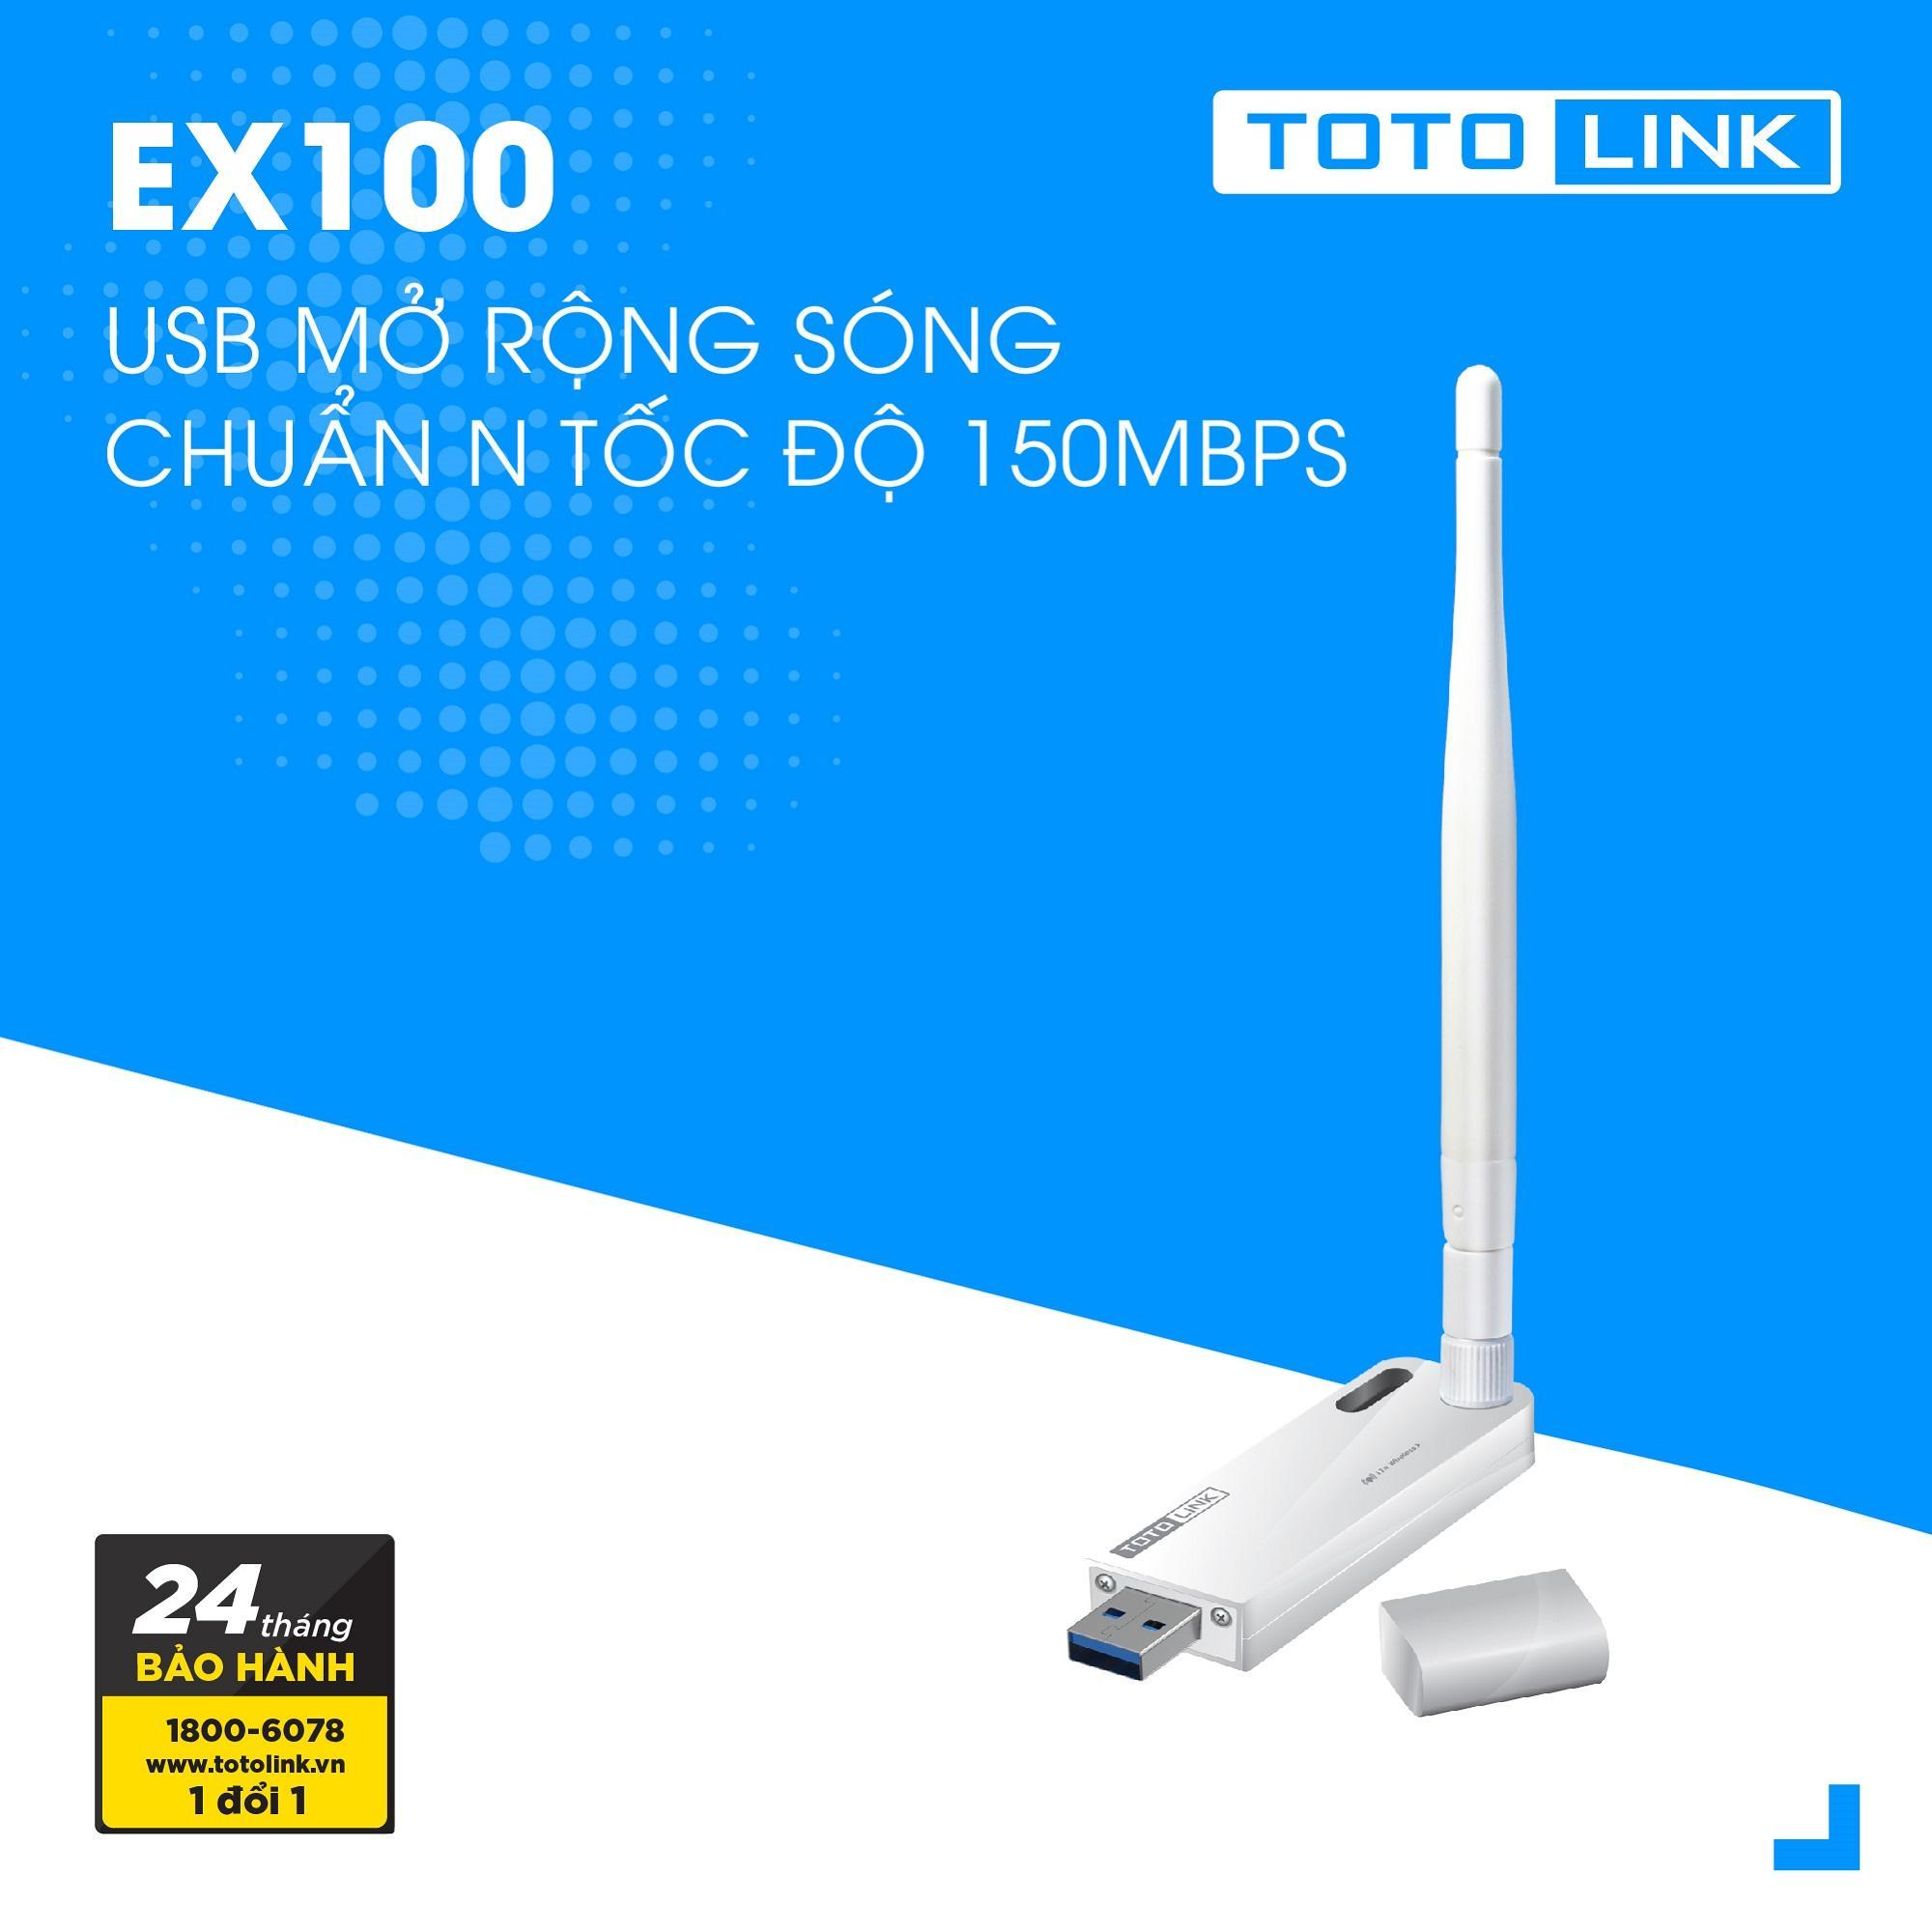 07_2019/EX100_1.jpg